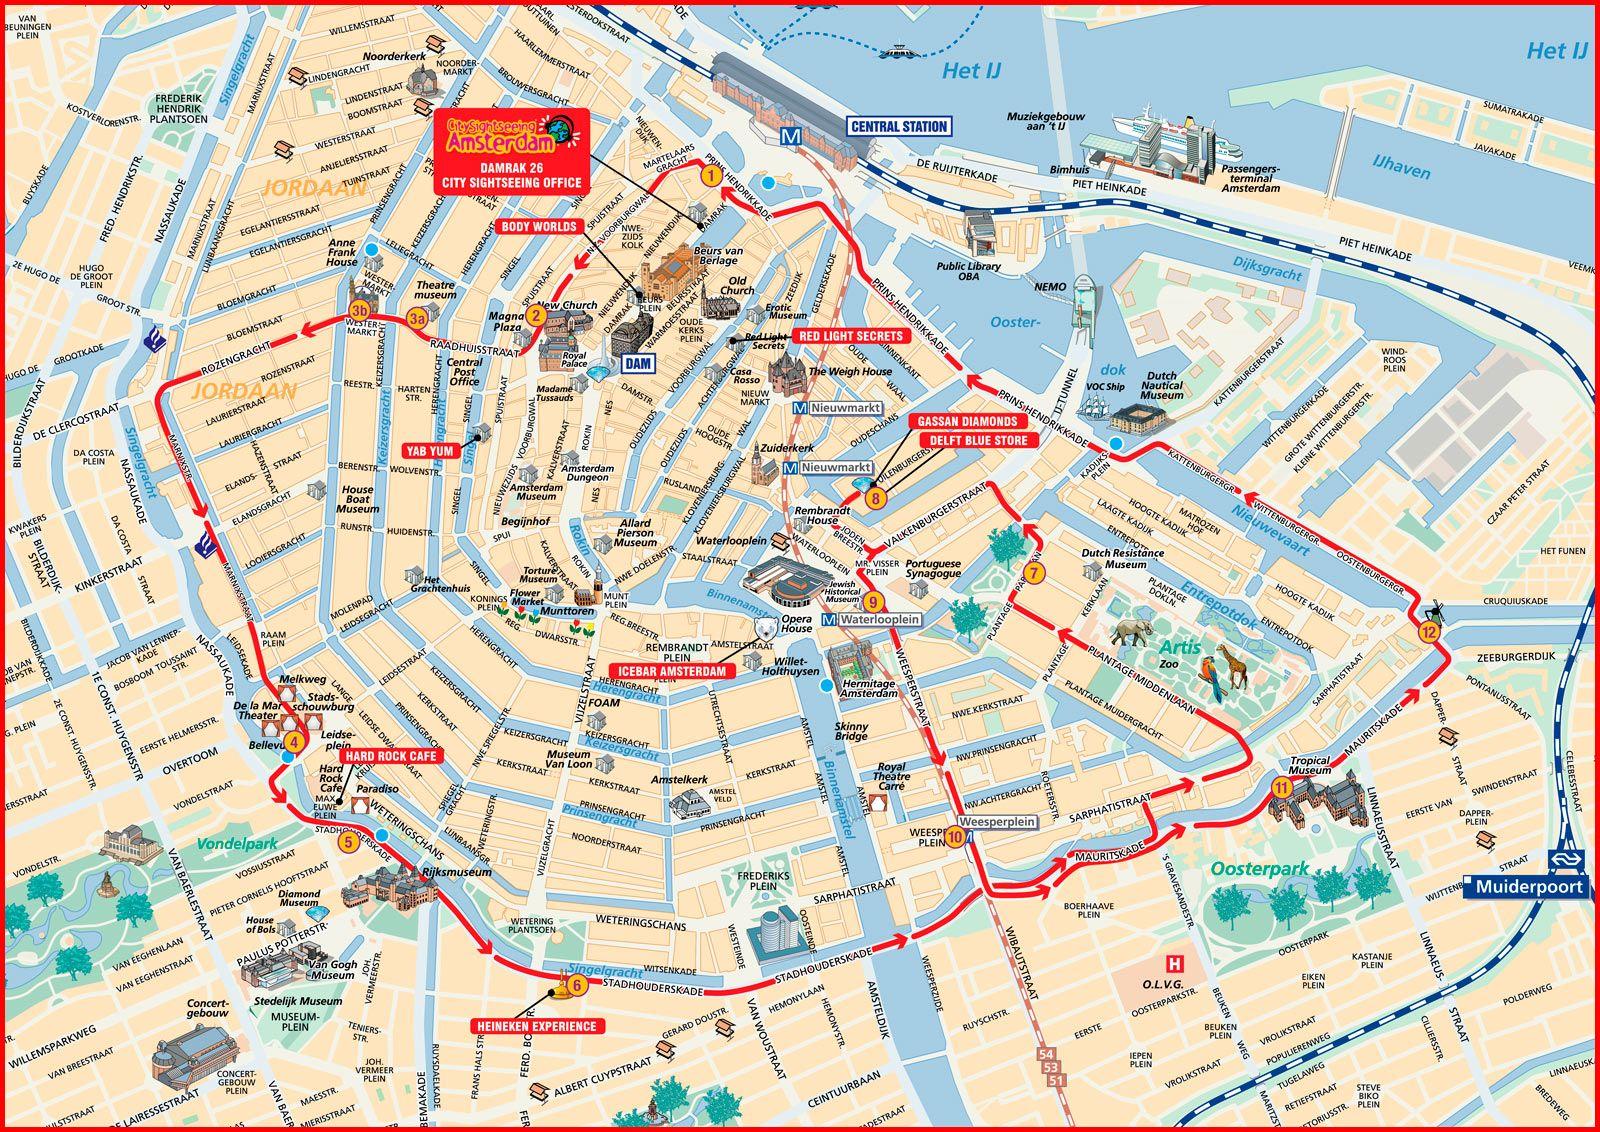 Amsterdam Hop On Hop Off map